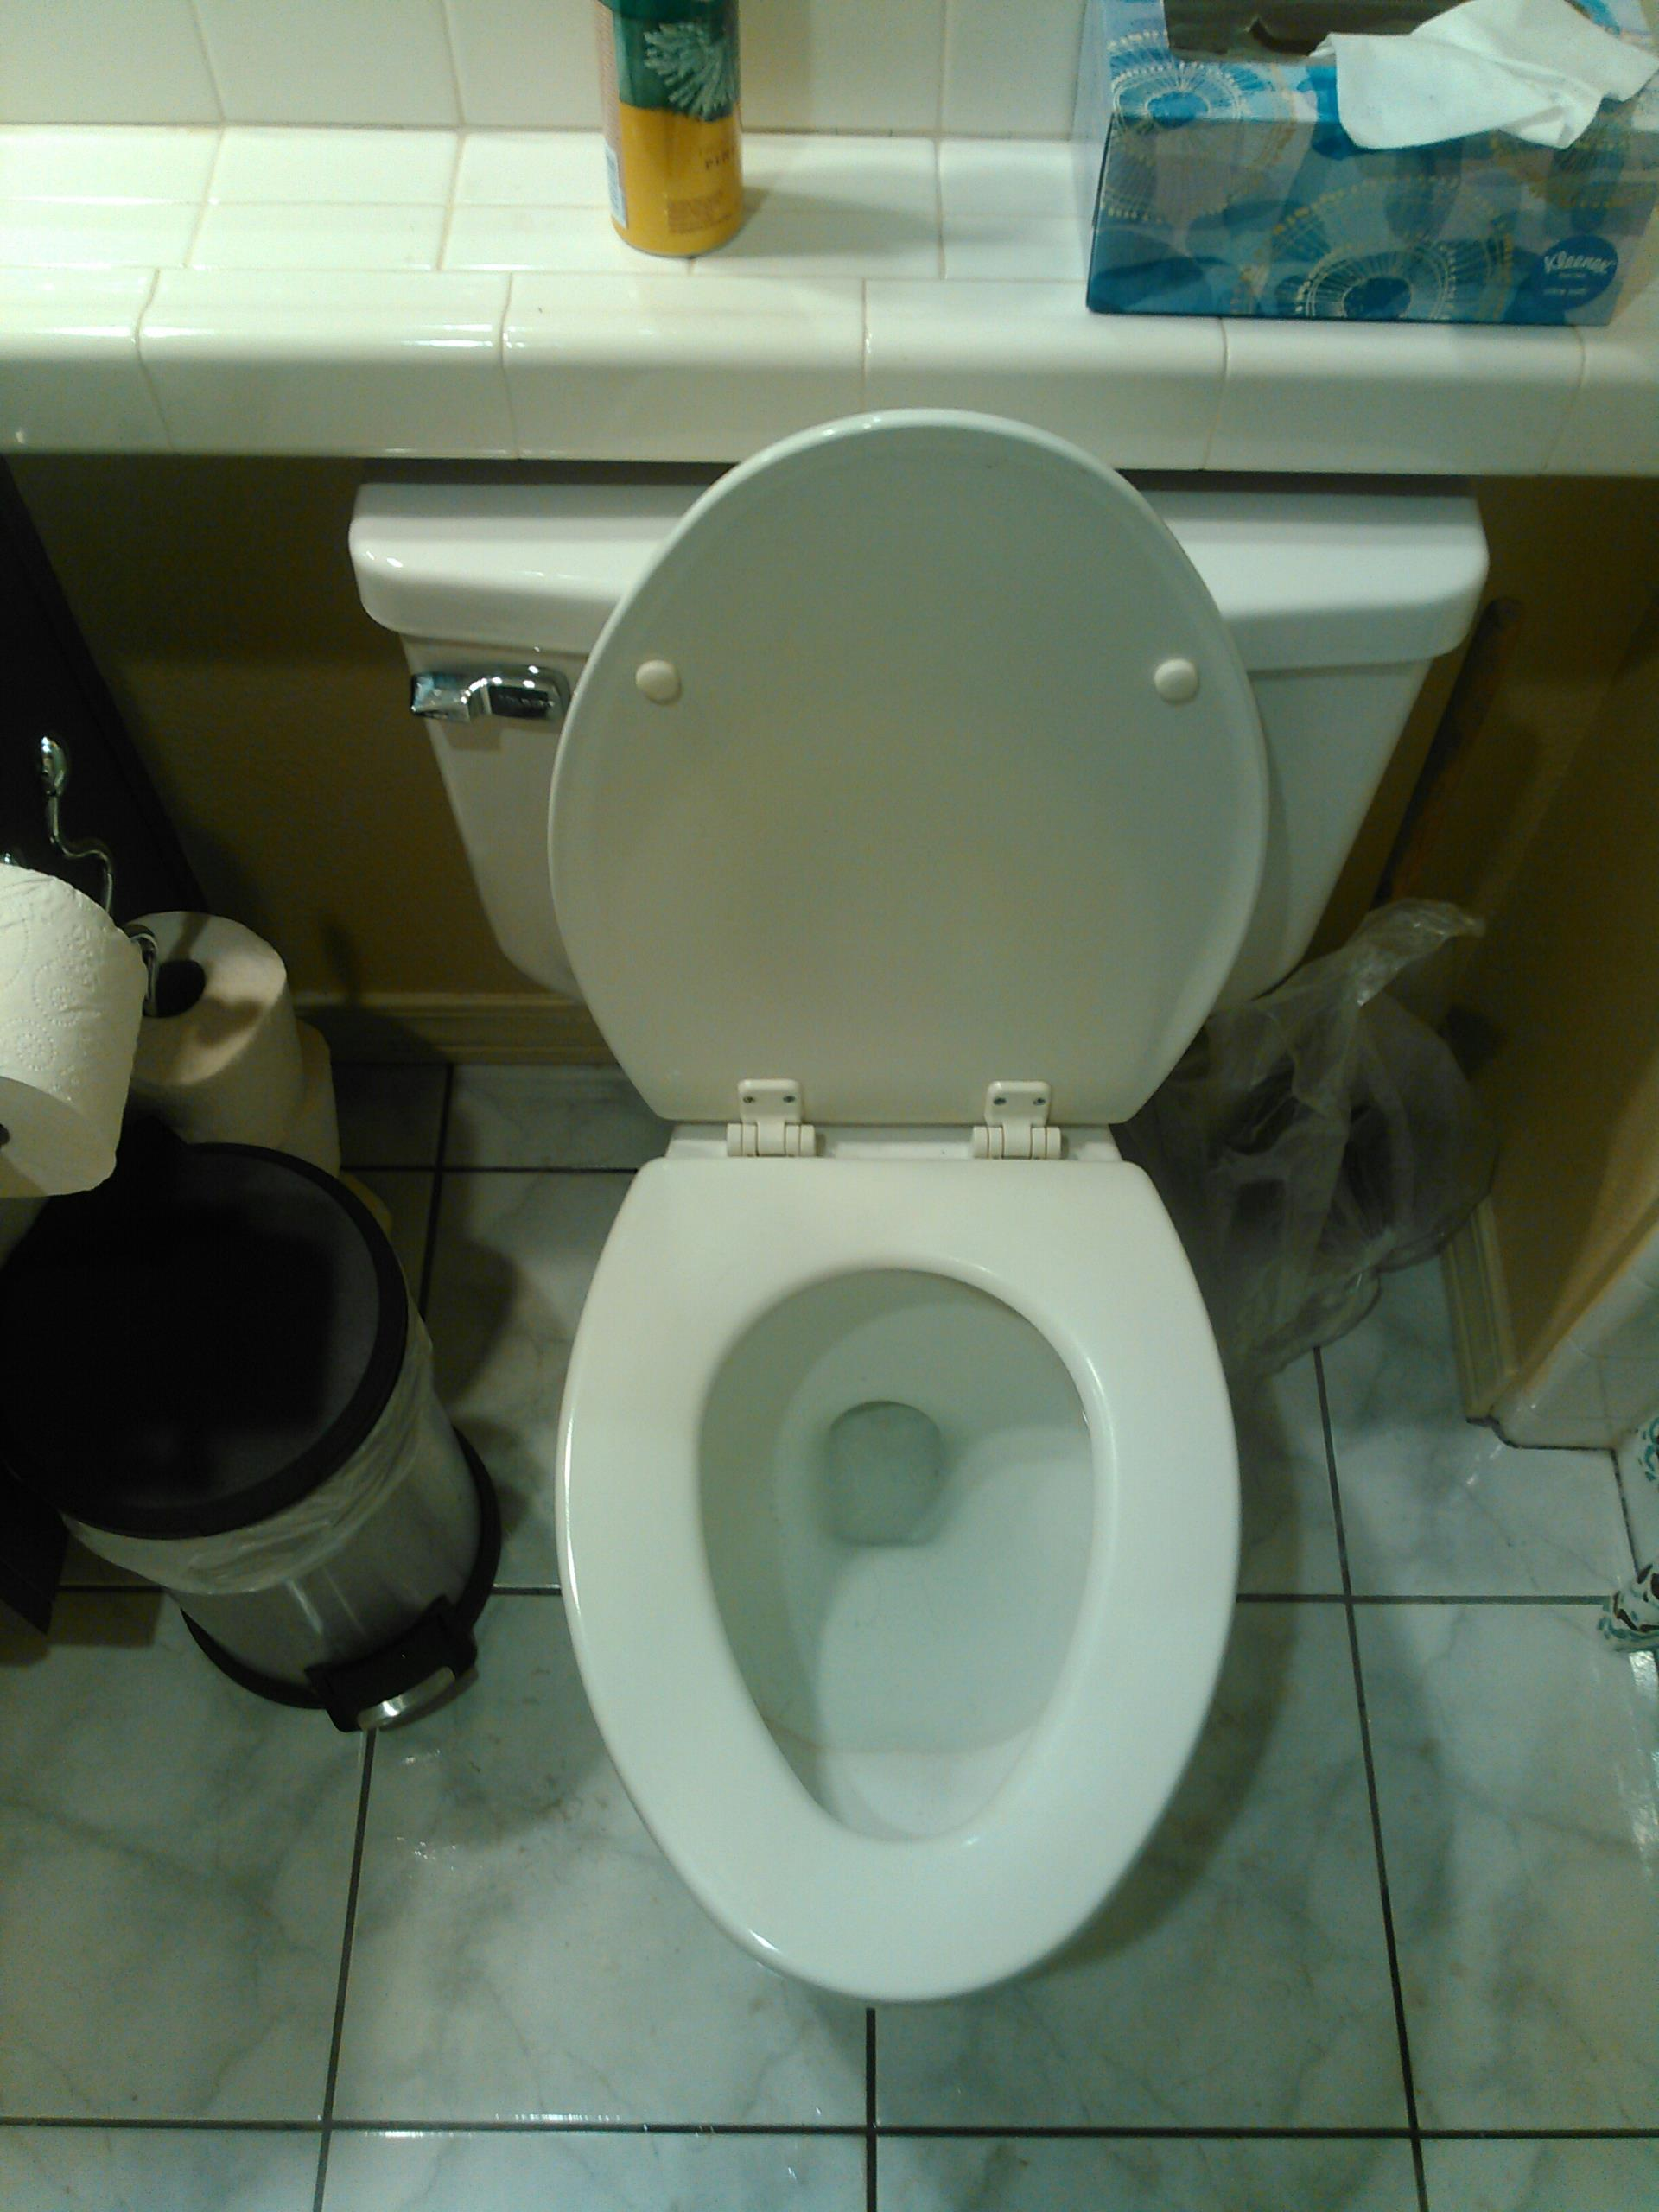 Rancho Cucamonga, CA - Toilet stoppage